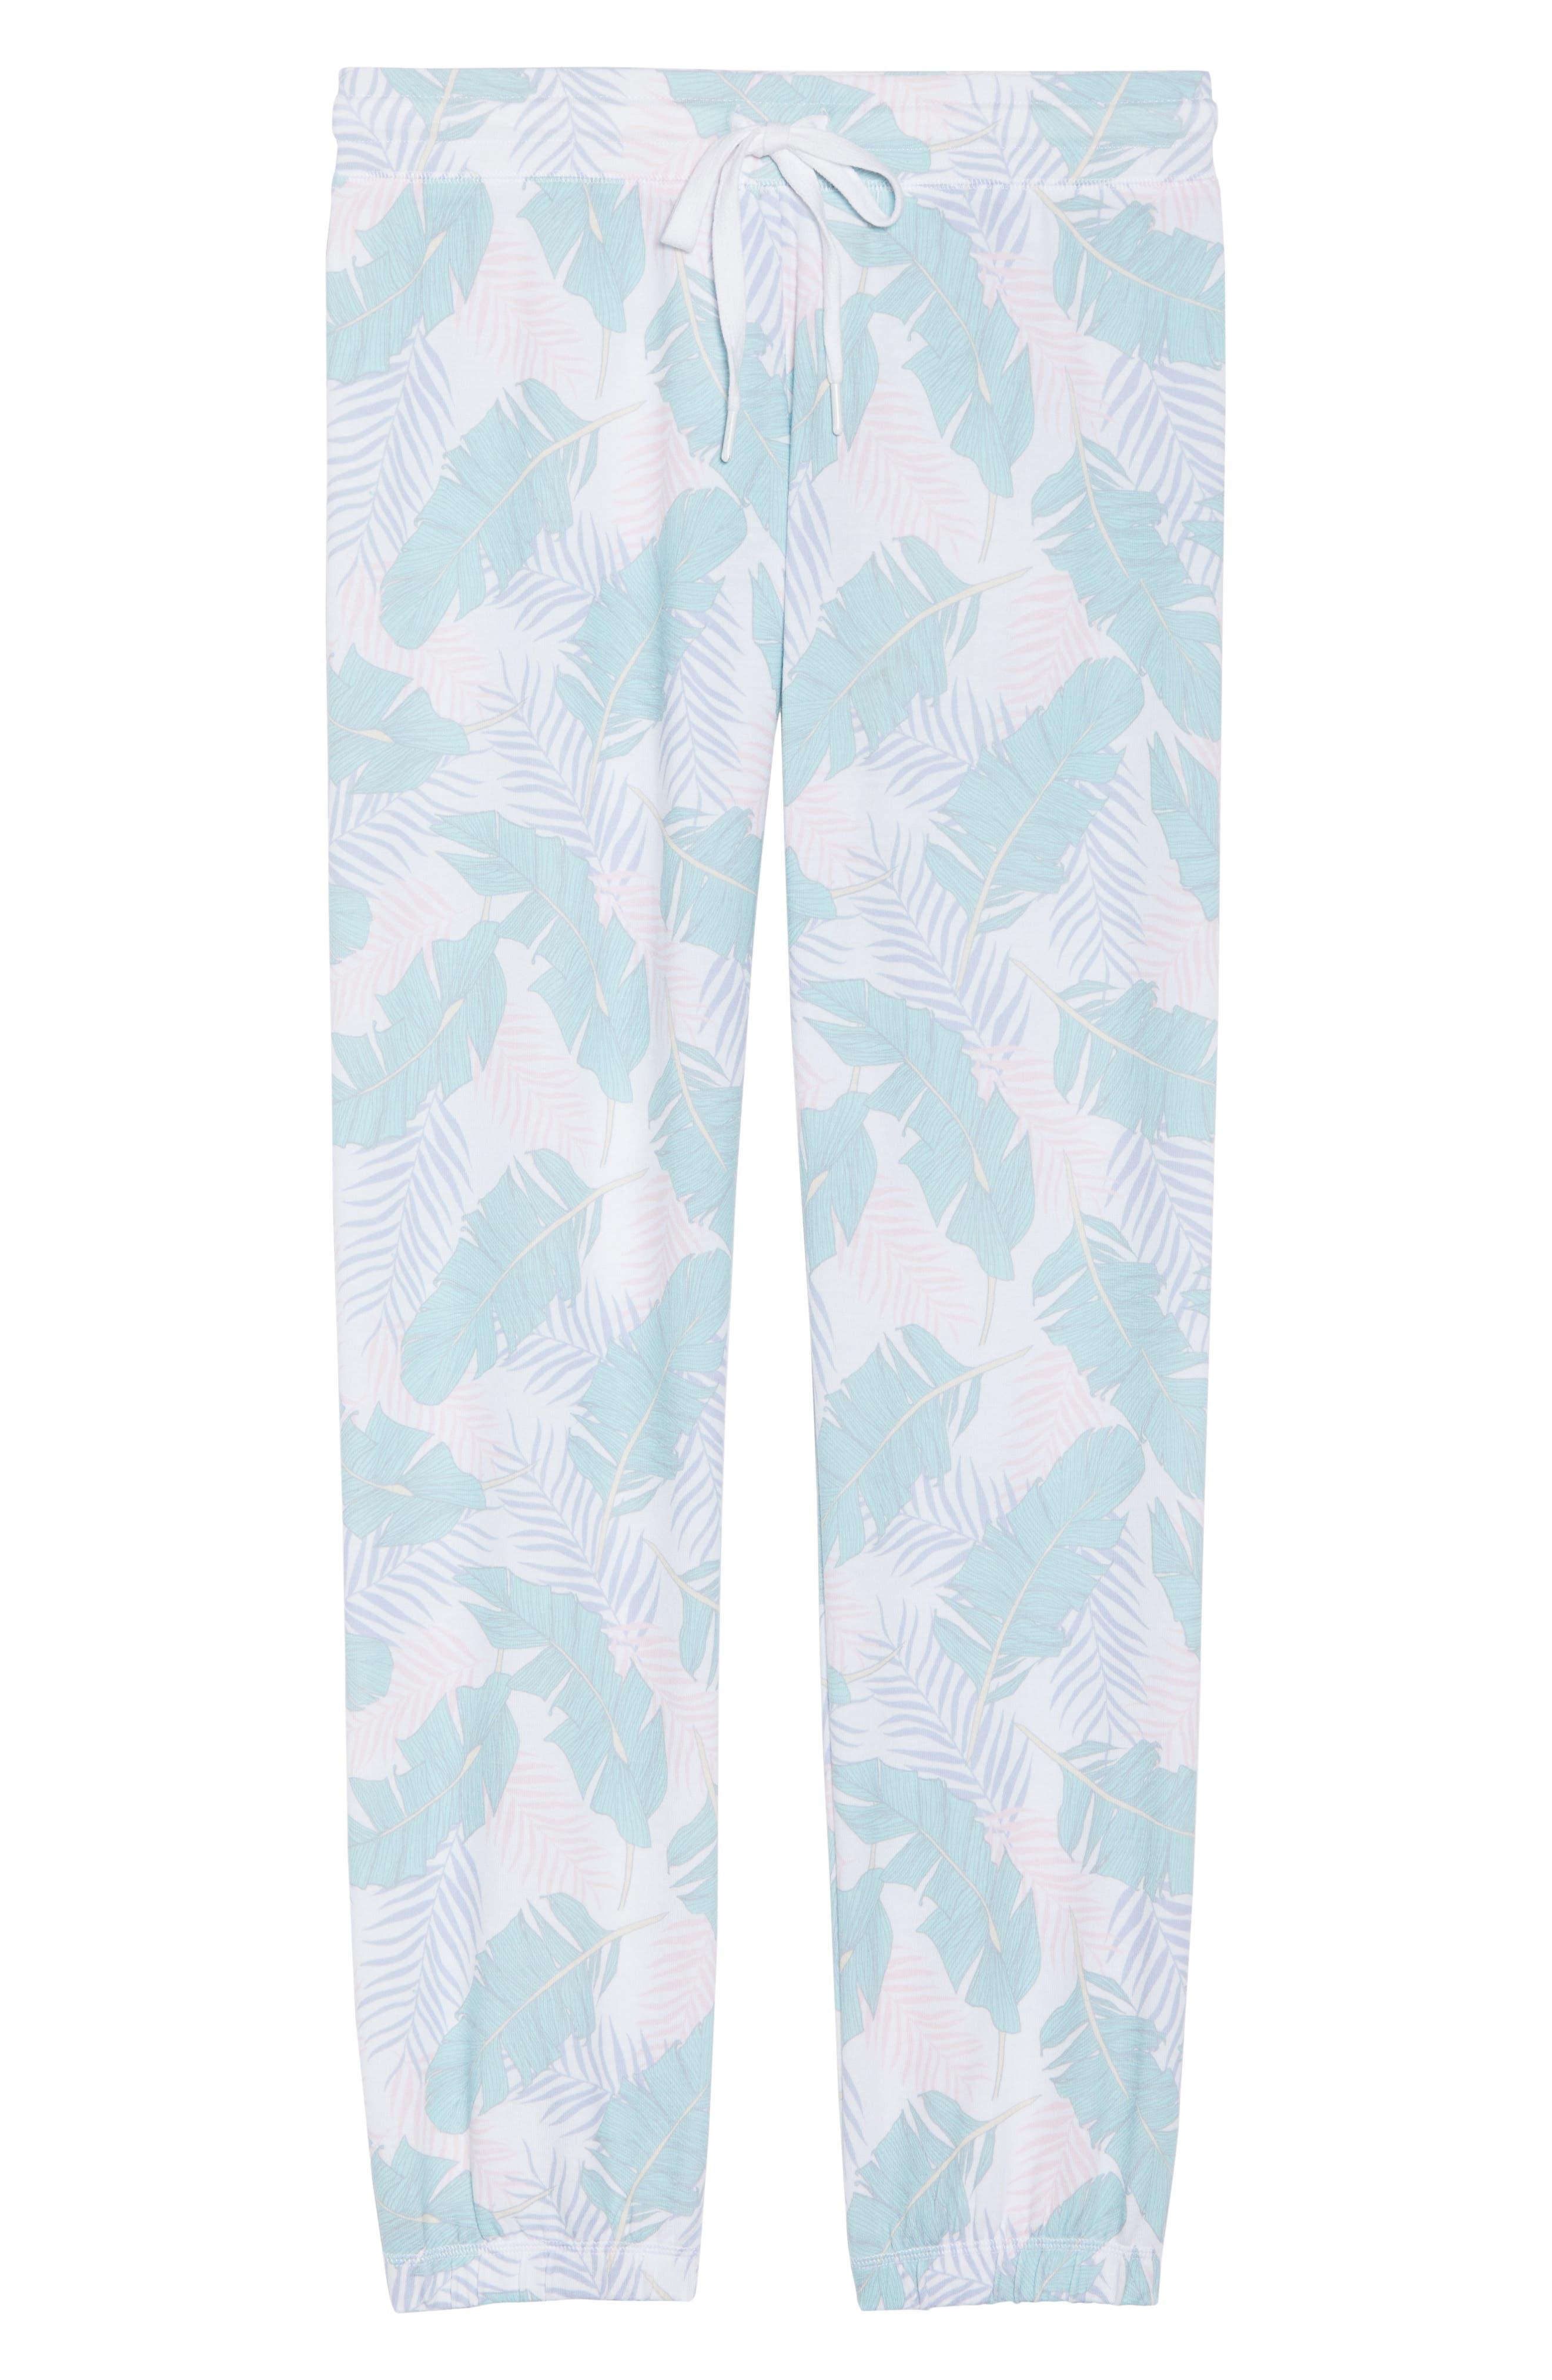 Peachy Jogger Lounge Pants,                             Alternate thumbnail 4, color,                             White